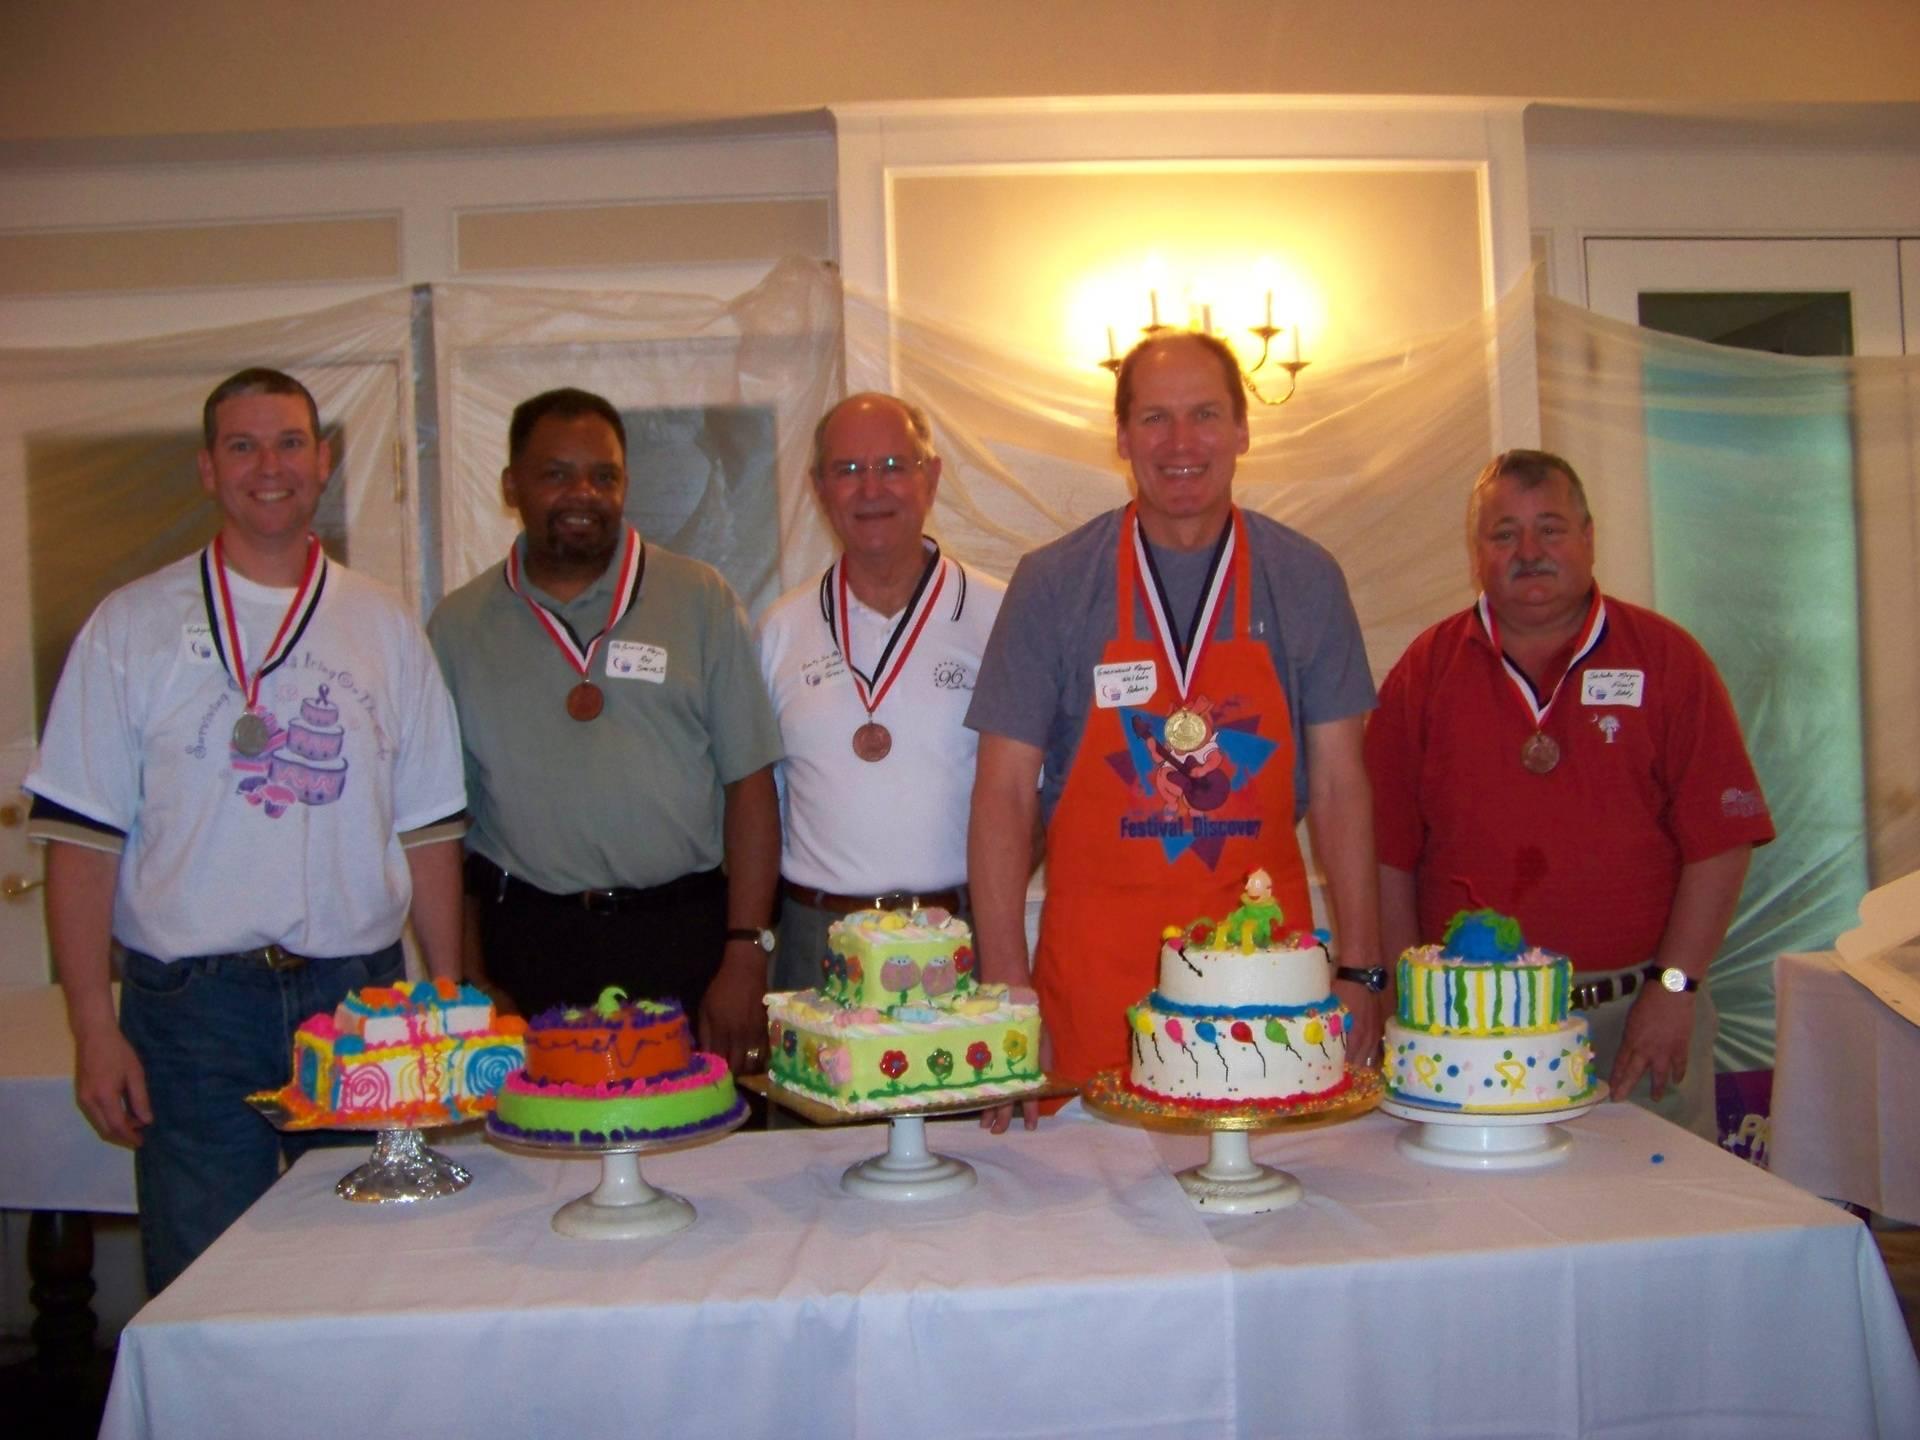 Cake Decorating Winners